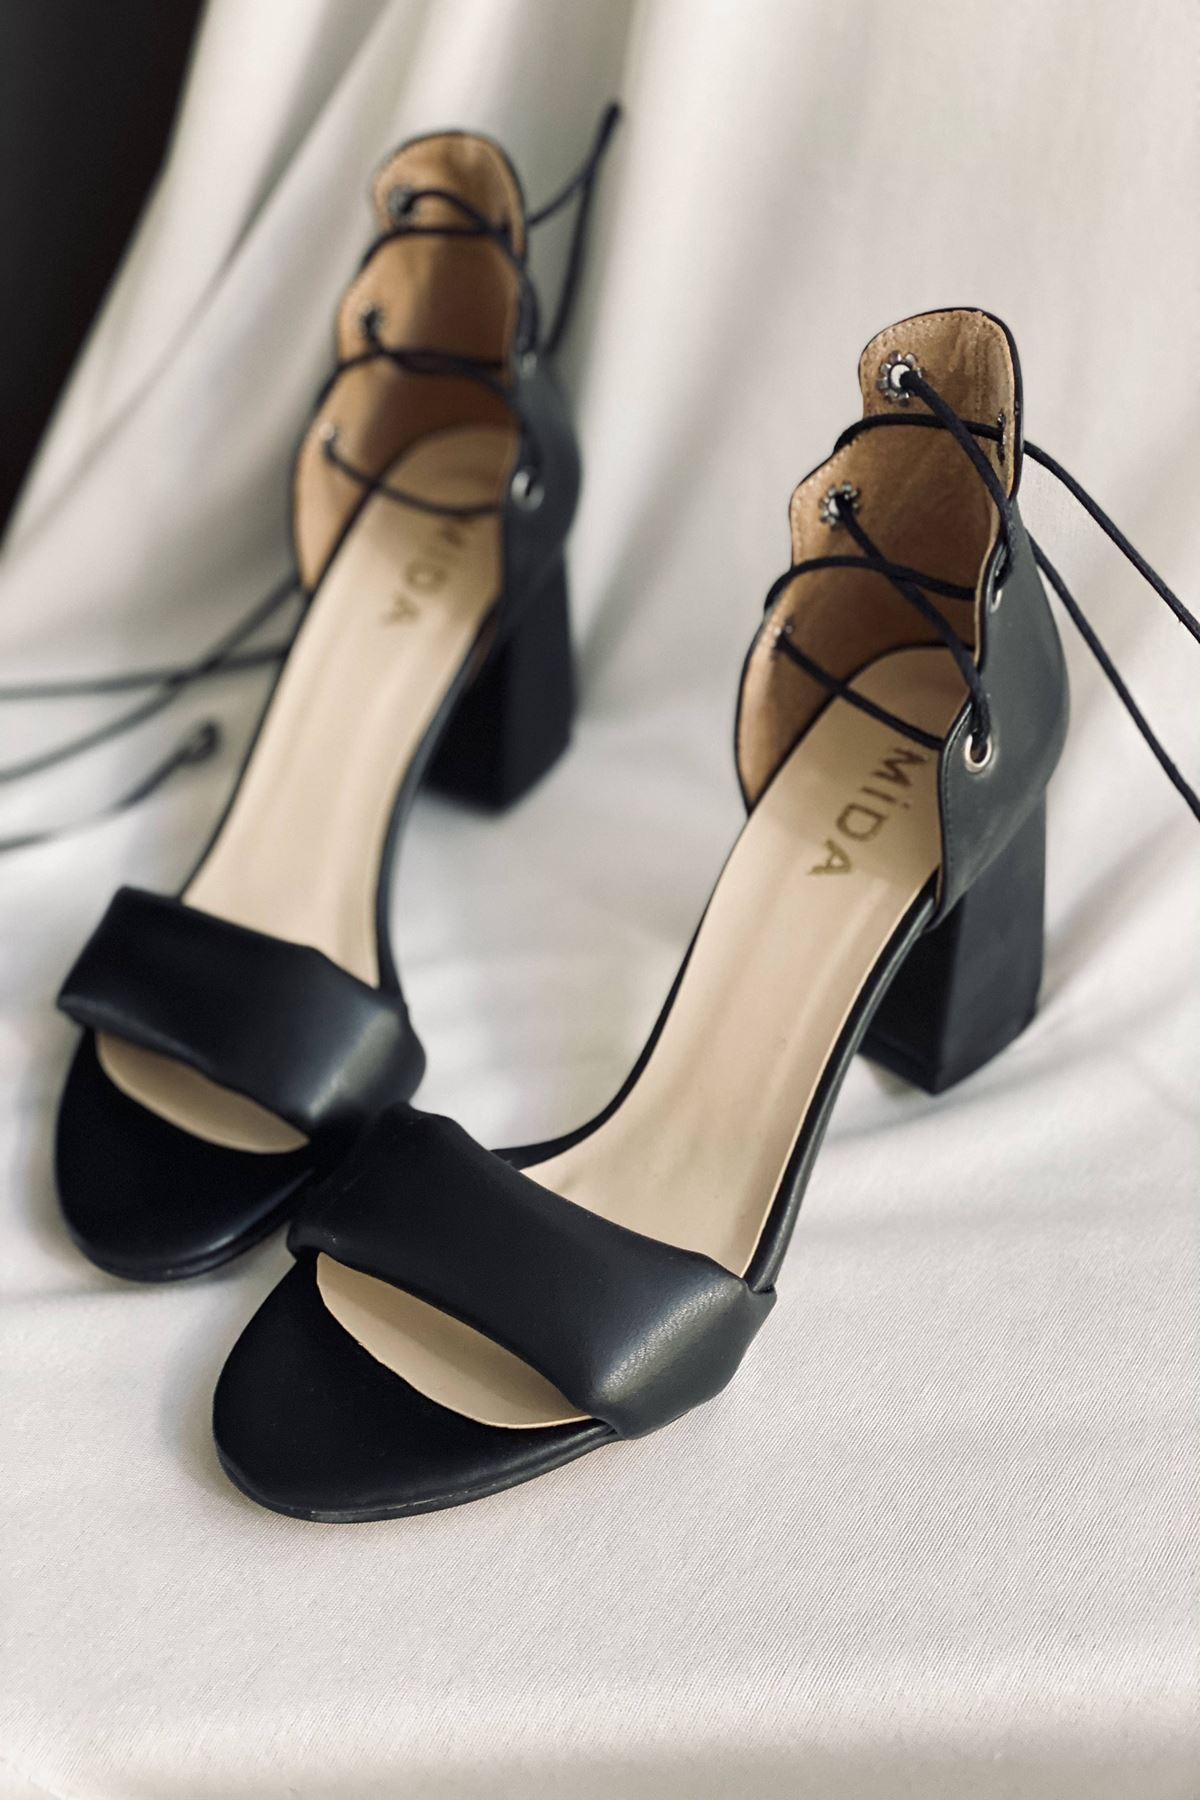 Y614 Siyah Deri Topuklu Ayakkabı